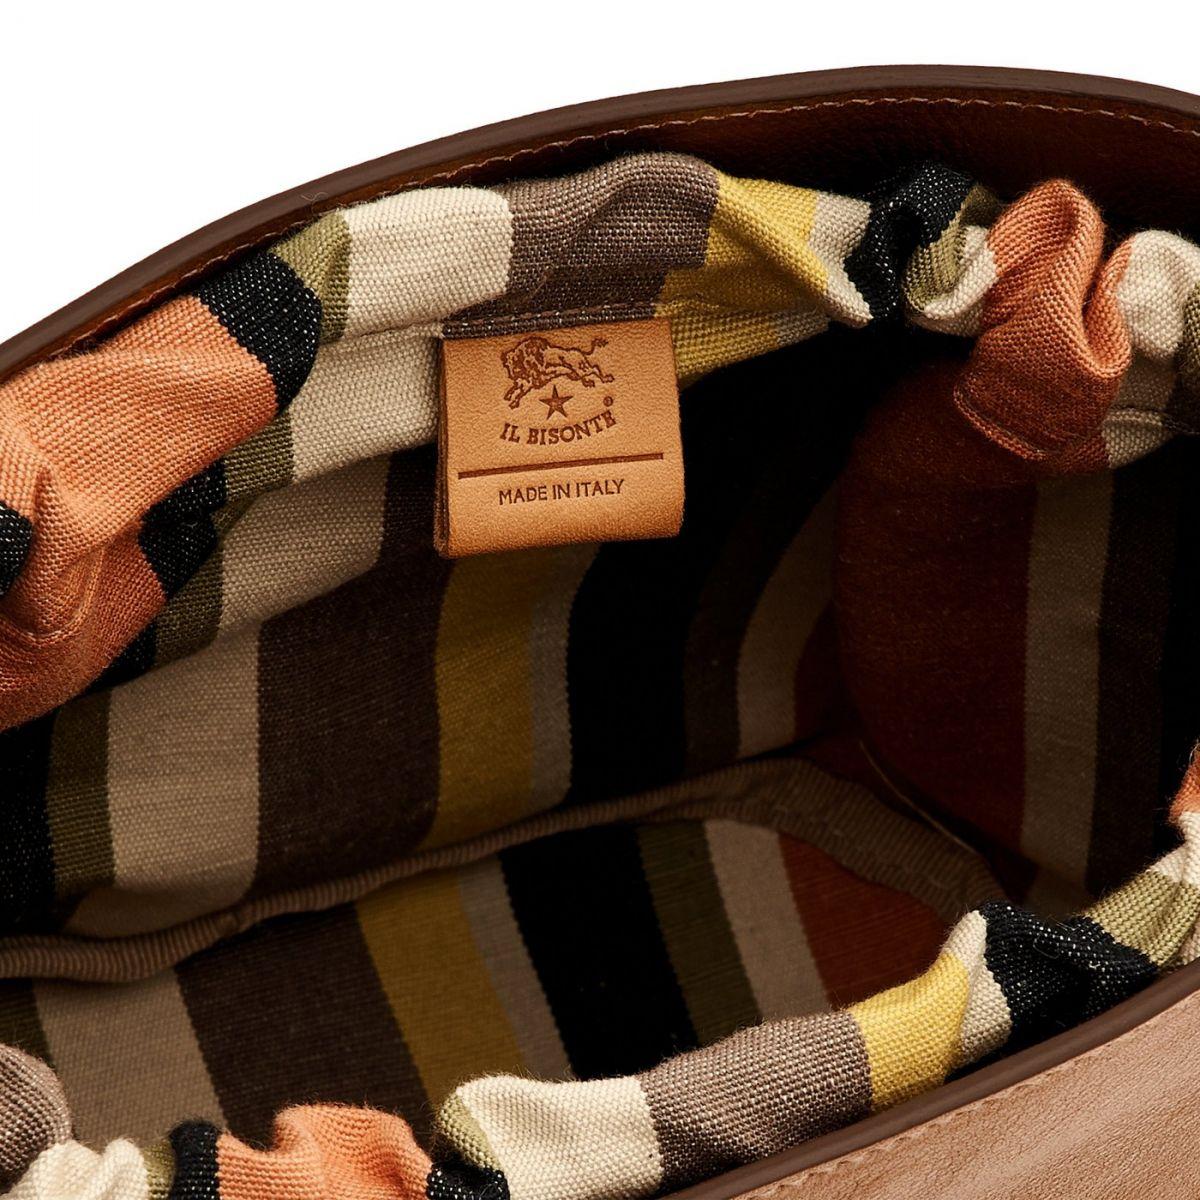 Women's Bucket Bag  in Cowhide Double Leather BBU018 color Black/Chocolate | Details